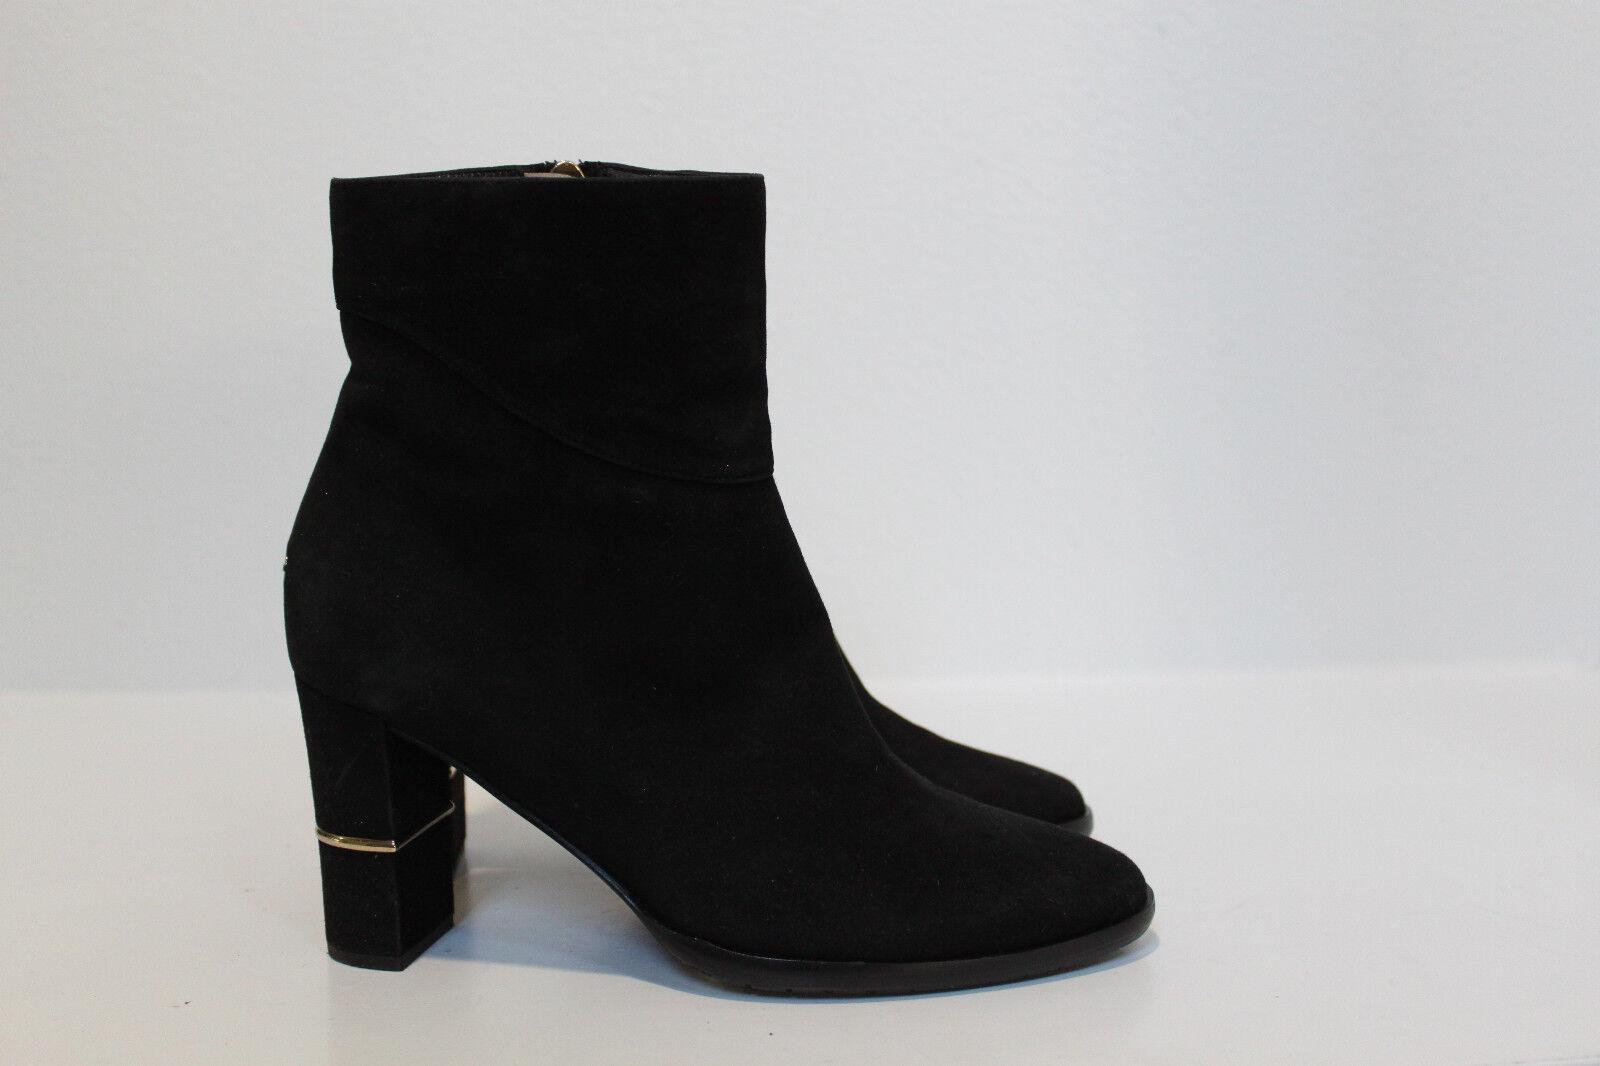 sz 7 / 37 Jimmy Choo Black Suede Marcia Zip Side Block Heel Ankle Bootie Shoes